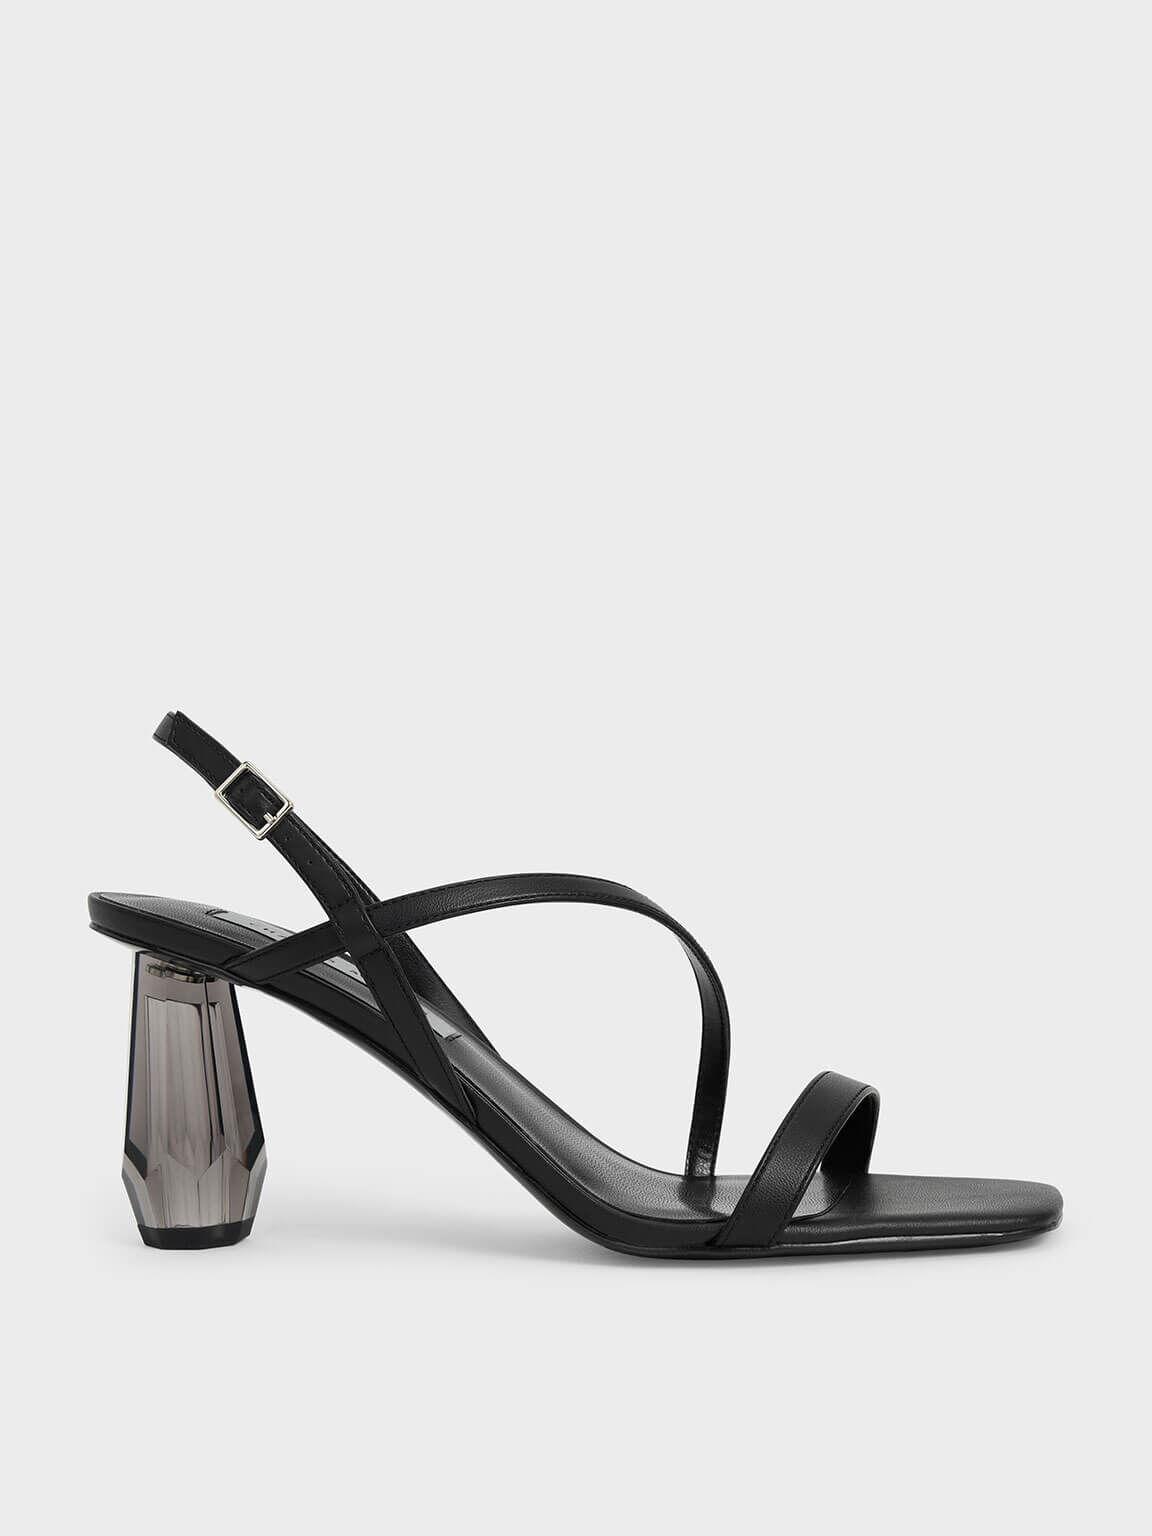 See-Through Sculptural Heel Sandals, Black, hi-res